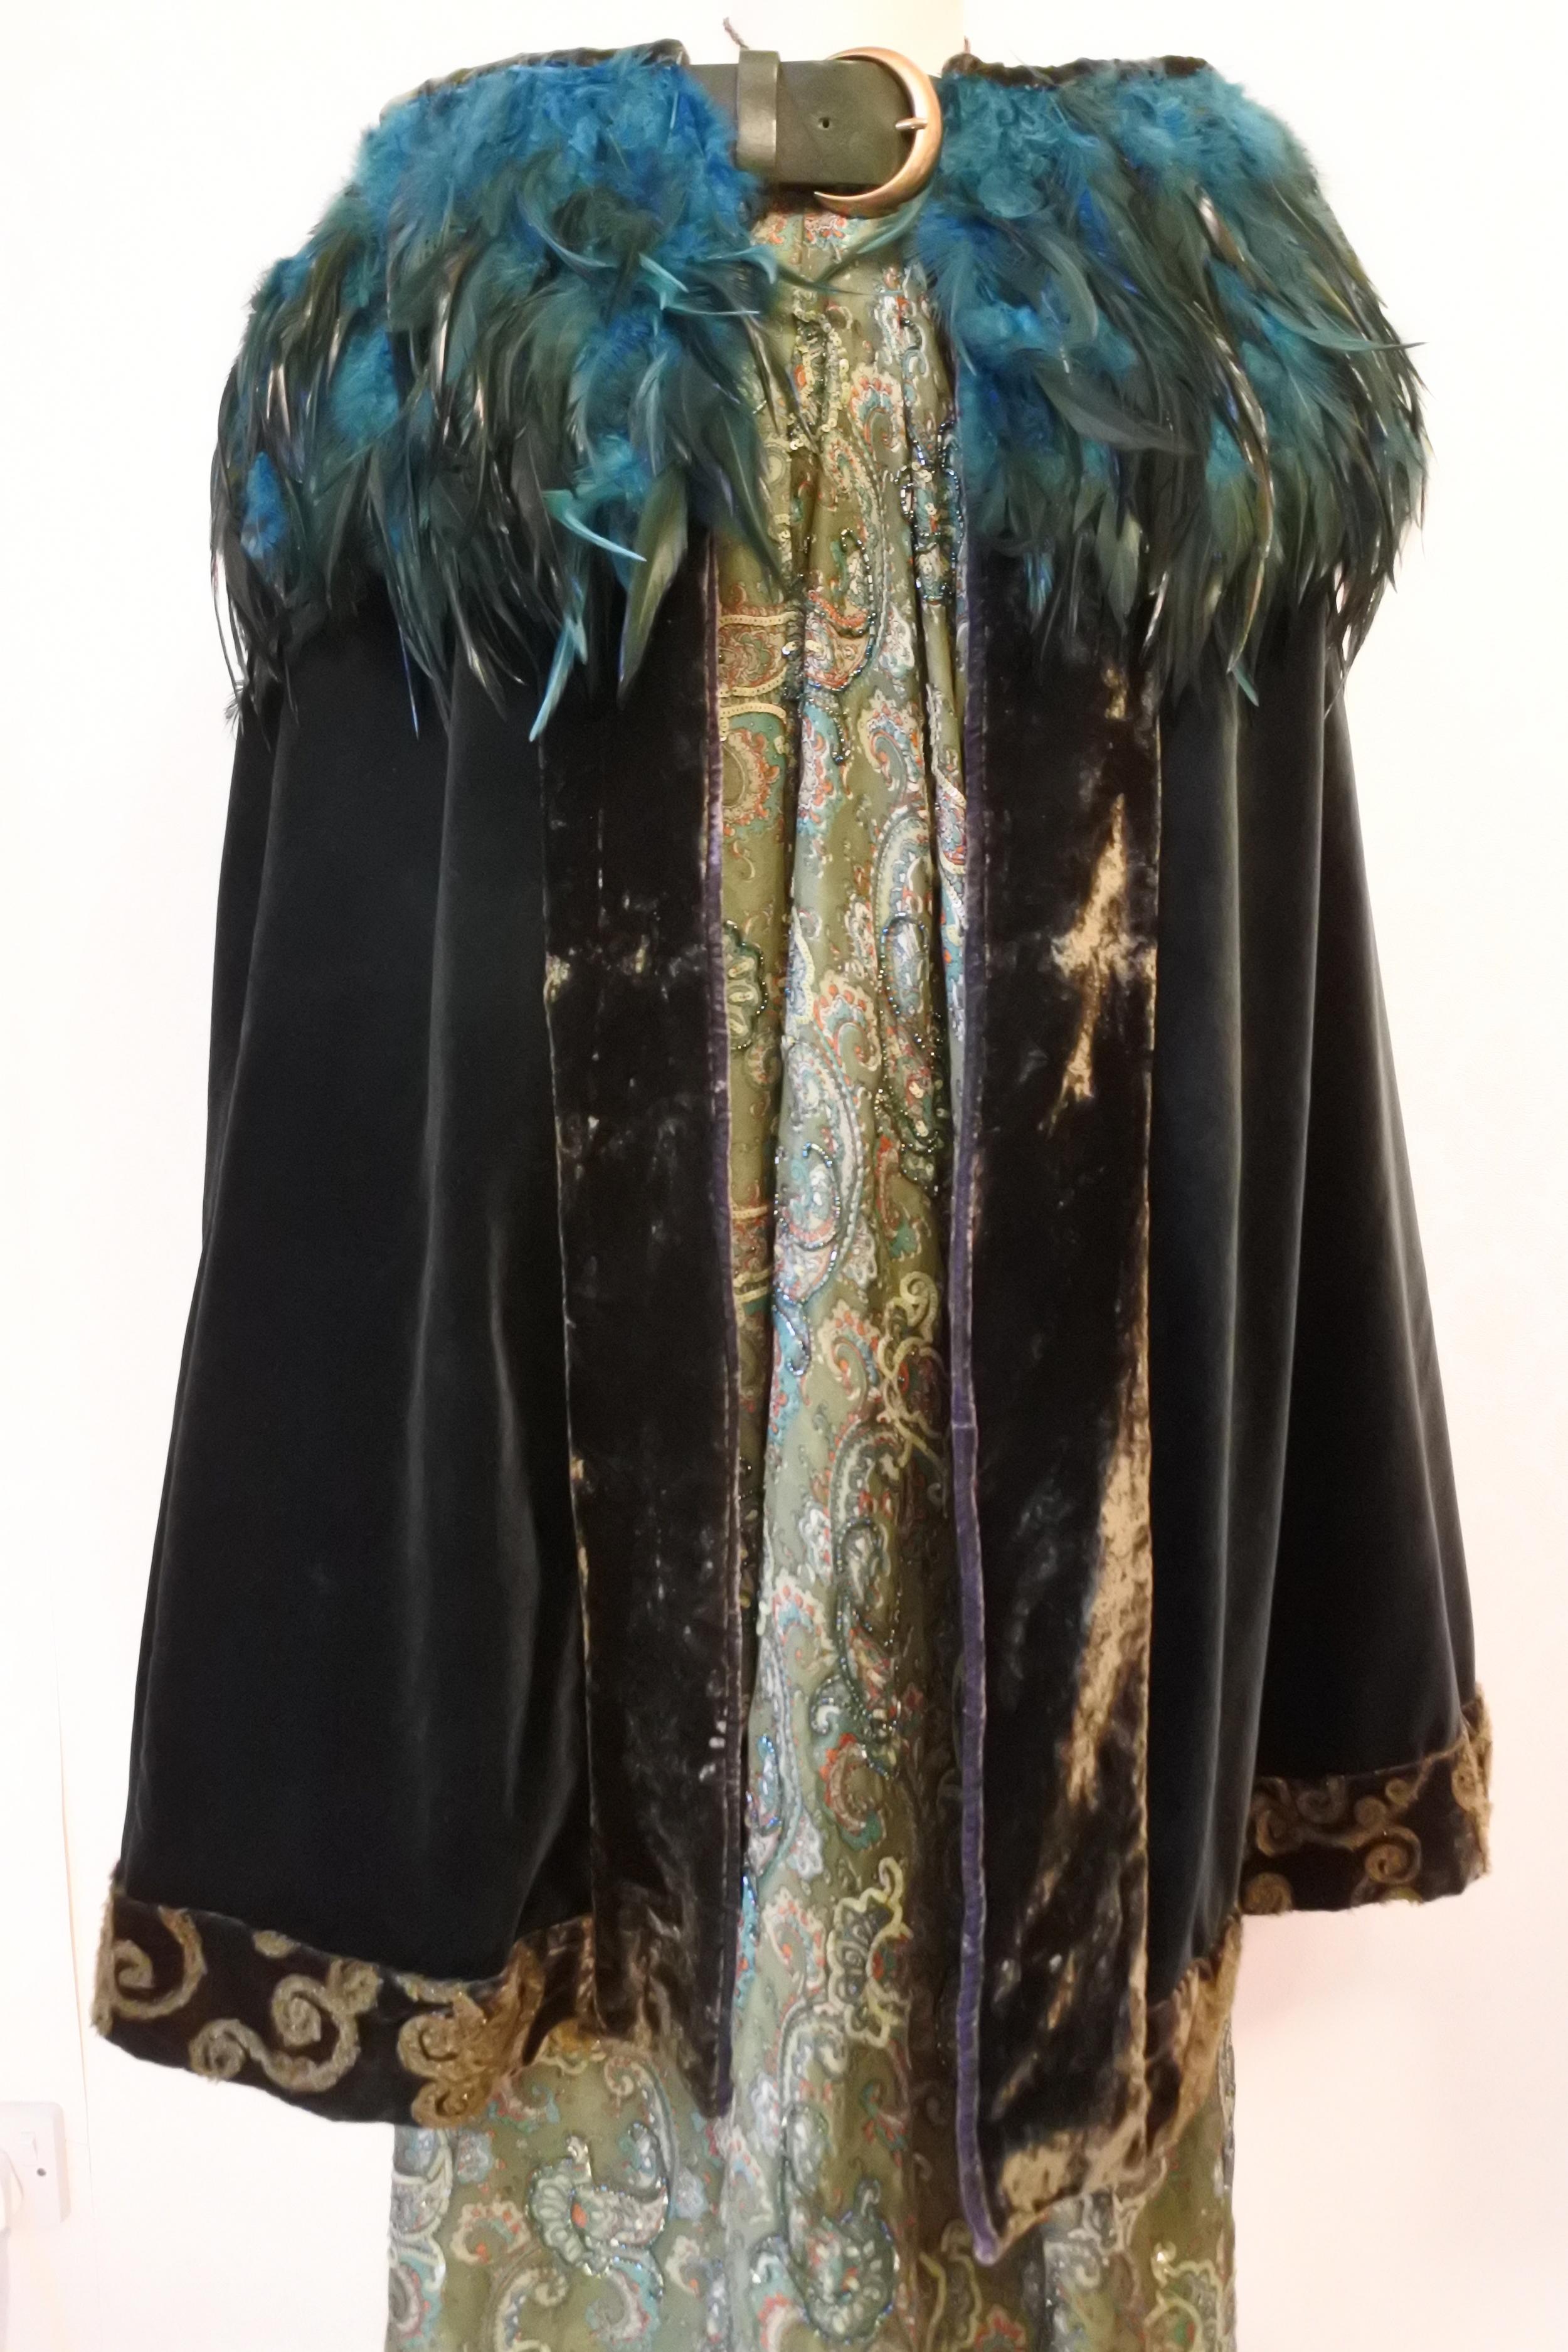 Emerald velvet cape with Celtic hem trim.